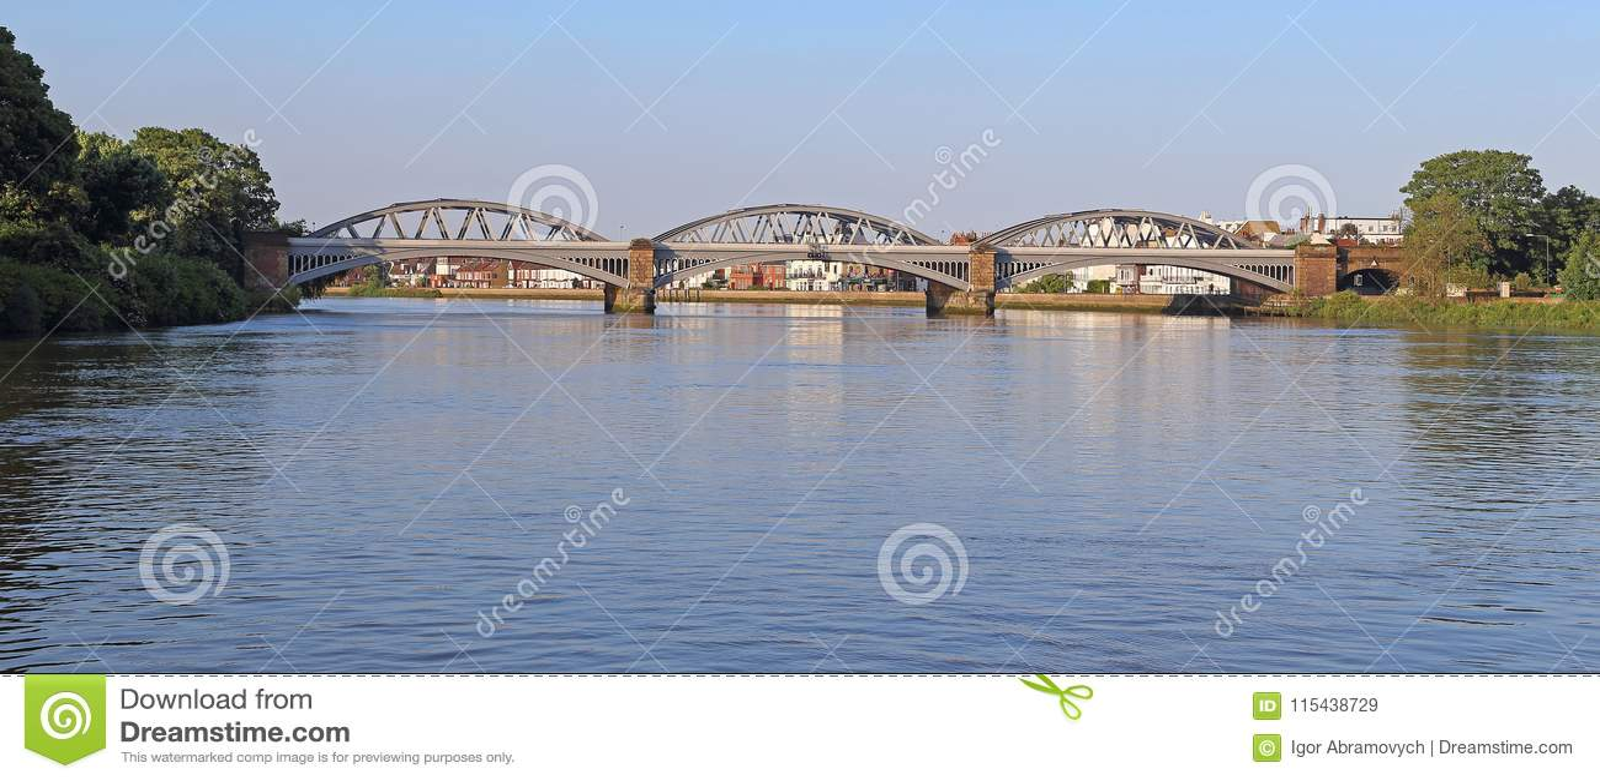 Barnes Bridge Over The River Thames, UK Editorial Stock ...